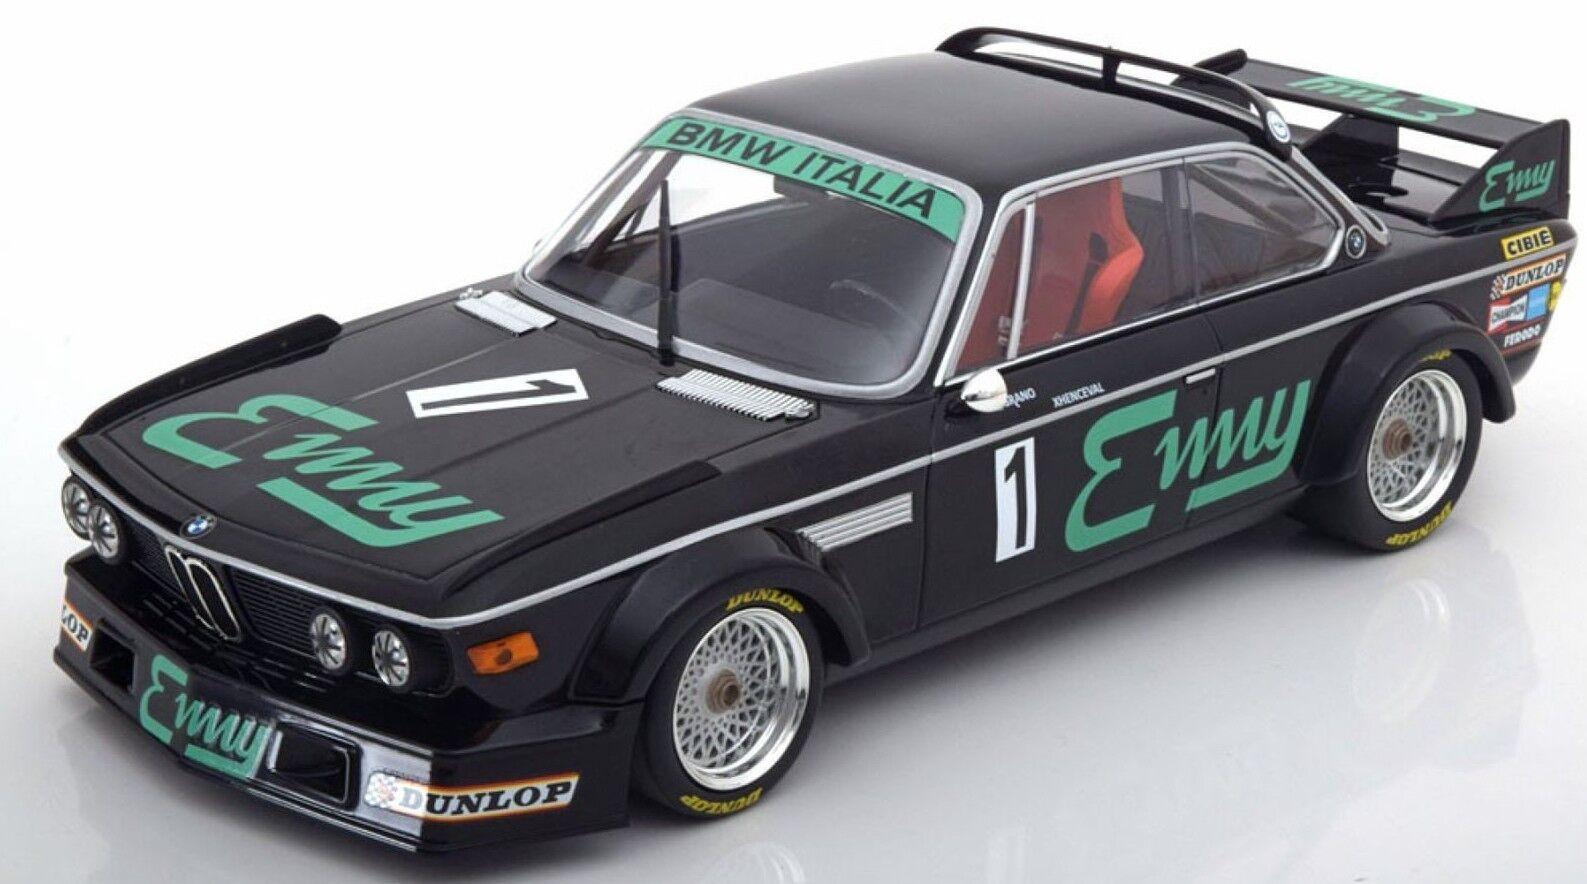 Minichamps 2018 BMW 3.0 CSL BMW Italia GranoXhenceval Brno GP 1:18New artículo